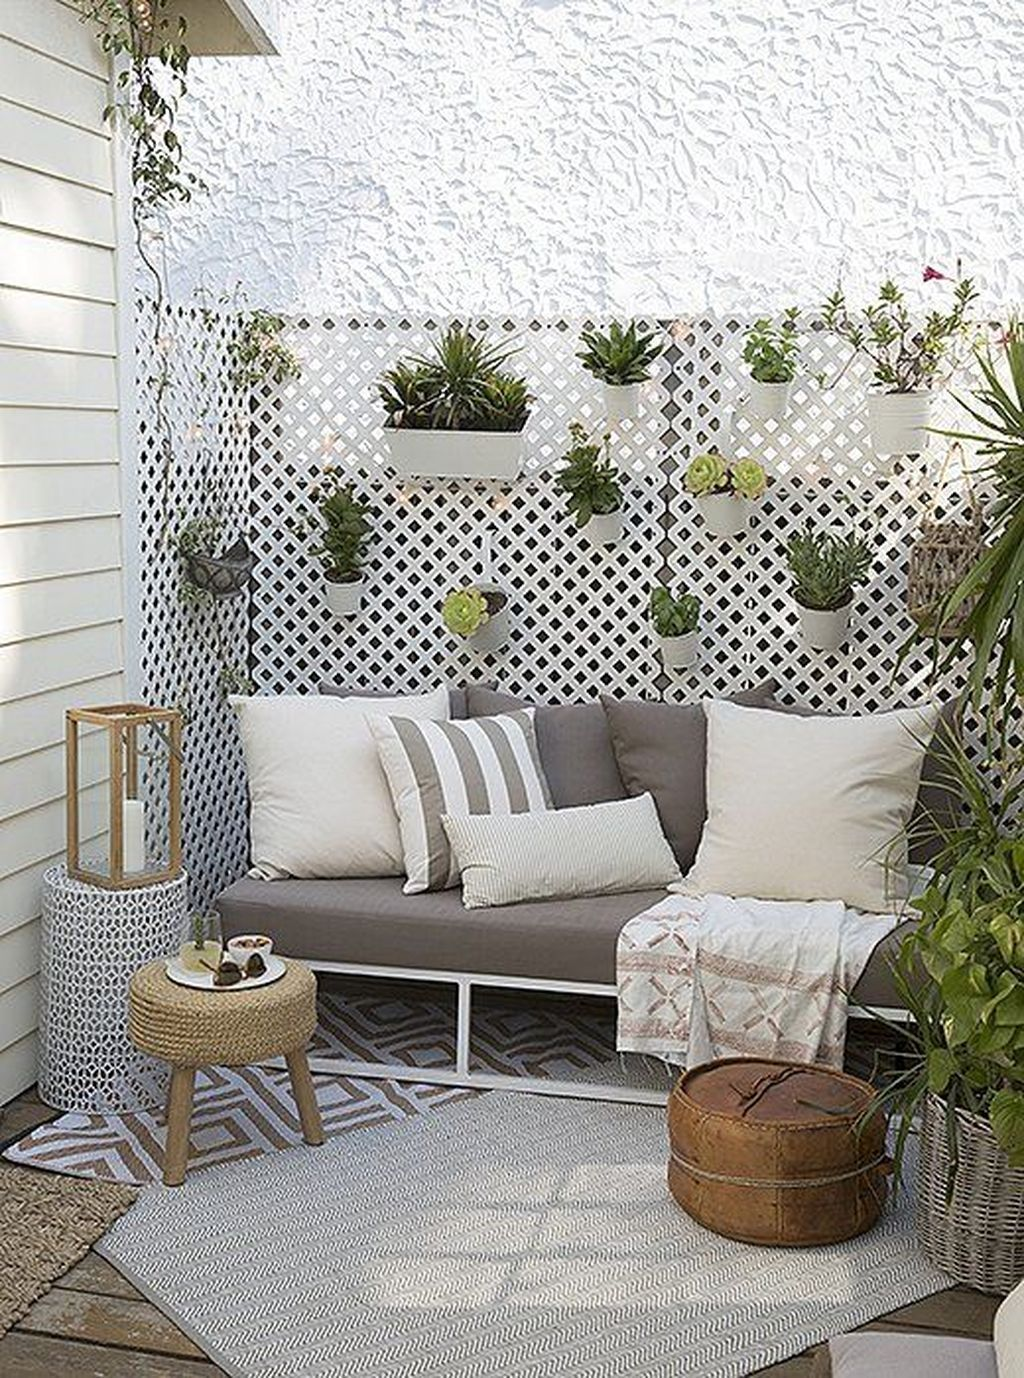 45 Fantastic Small Patio On Backyard Ideas - HOMEWOWDECOR